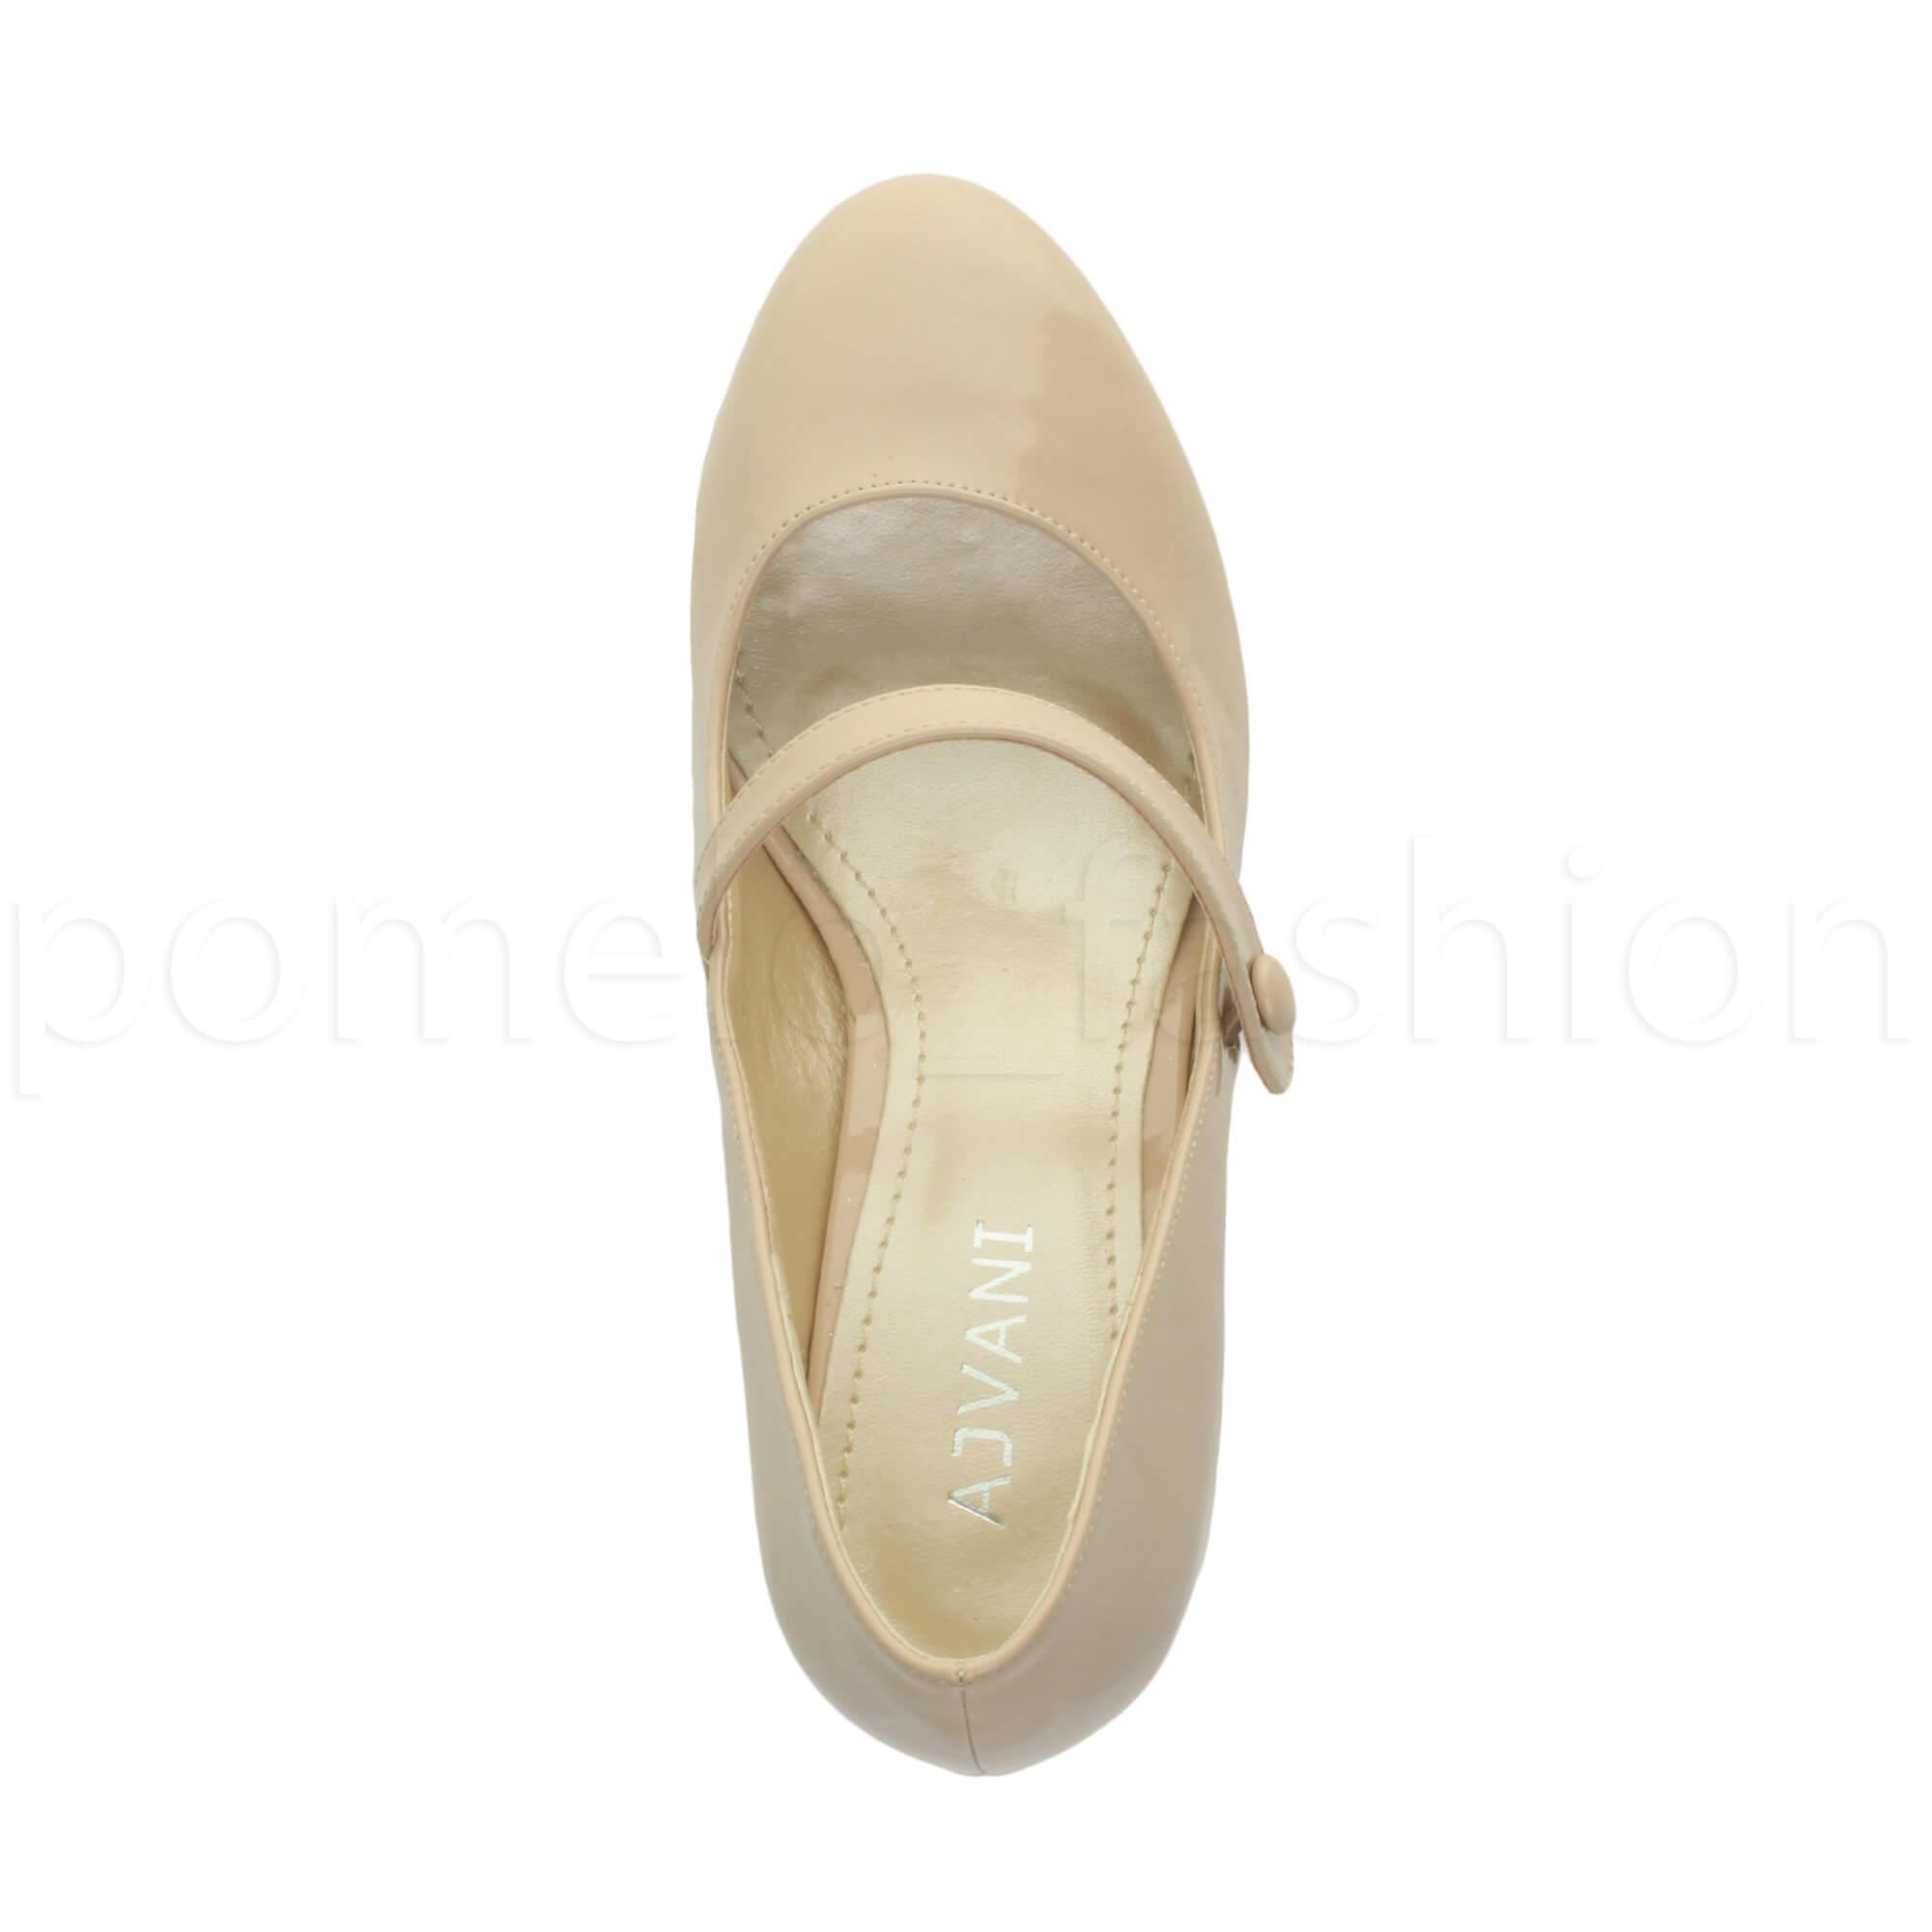 miniatura 119 - Donna basso tacco medio Mary Jane Damigella Matrimonio Pompe Scarpe Da Sera Taglia